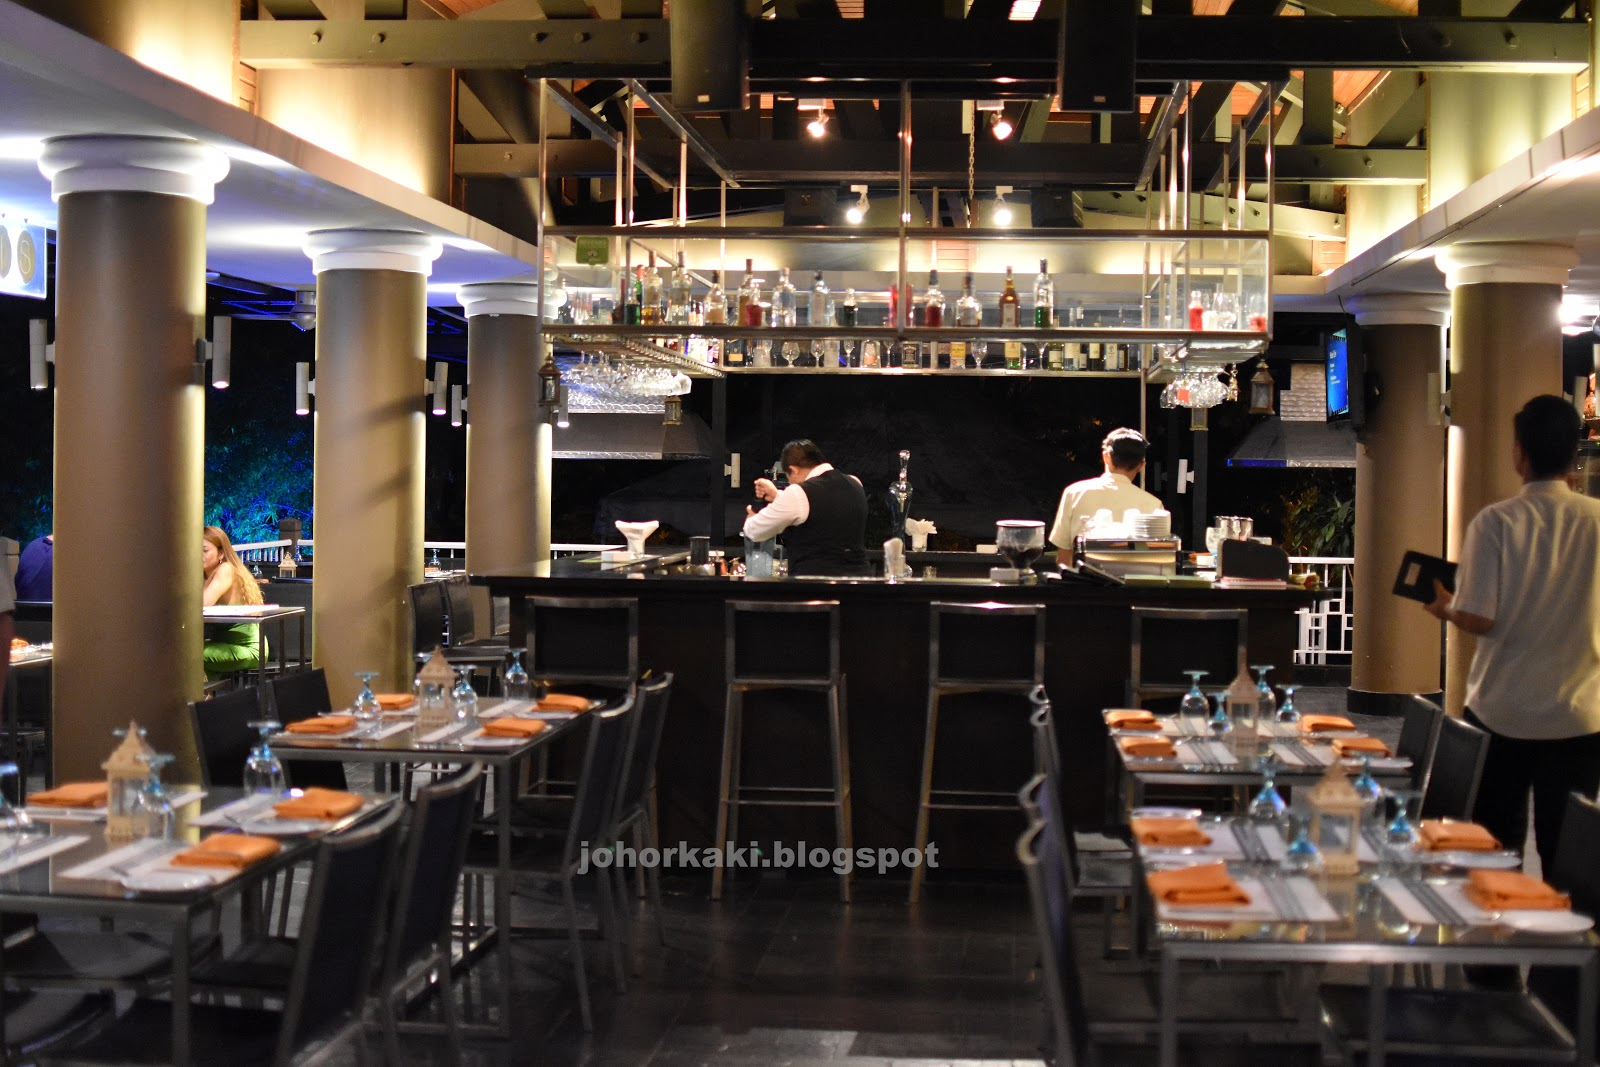 Oasis the italian restaurant at thistle johor bahru jk